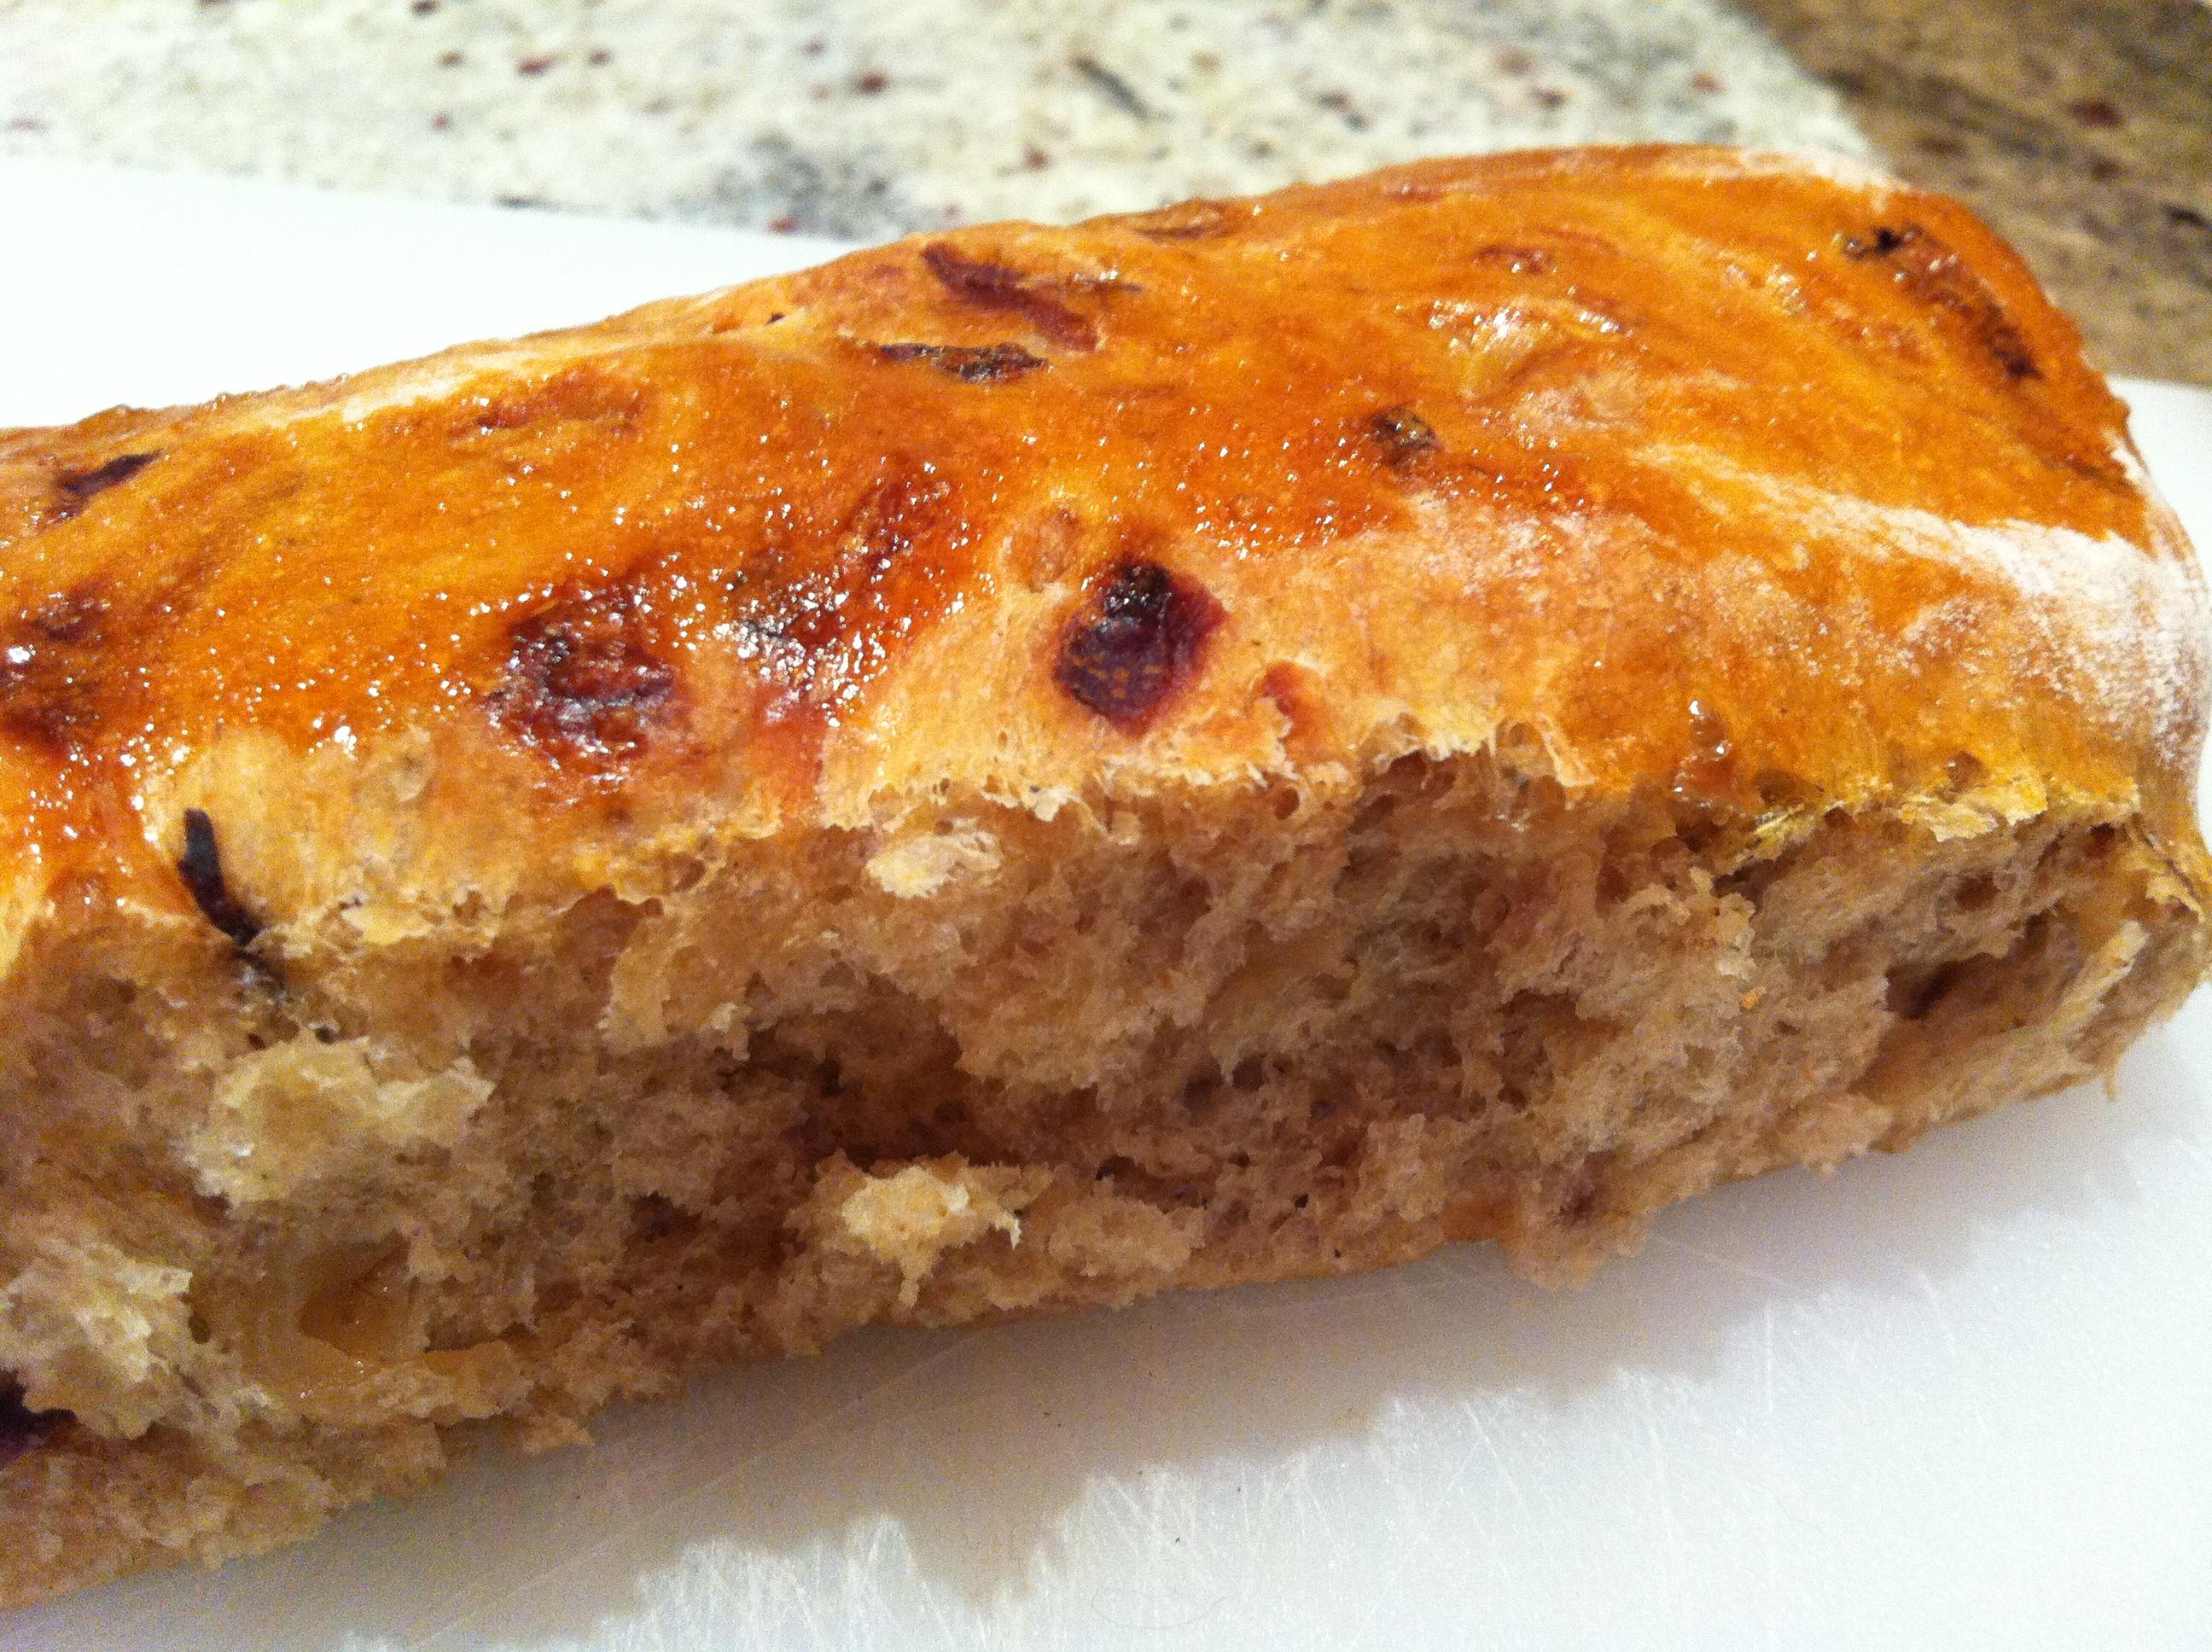 Dan Lepard's homemade onion hot dog buns - thelittleloaf